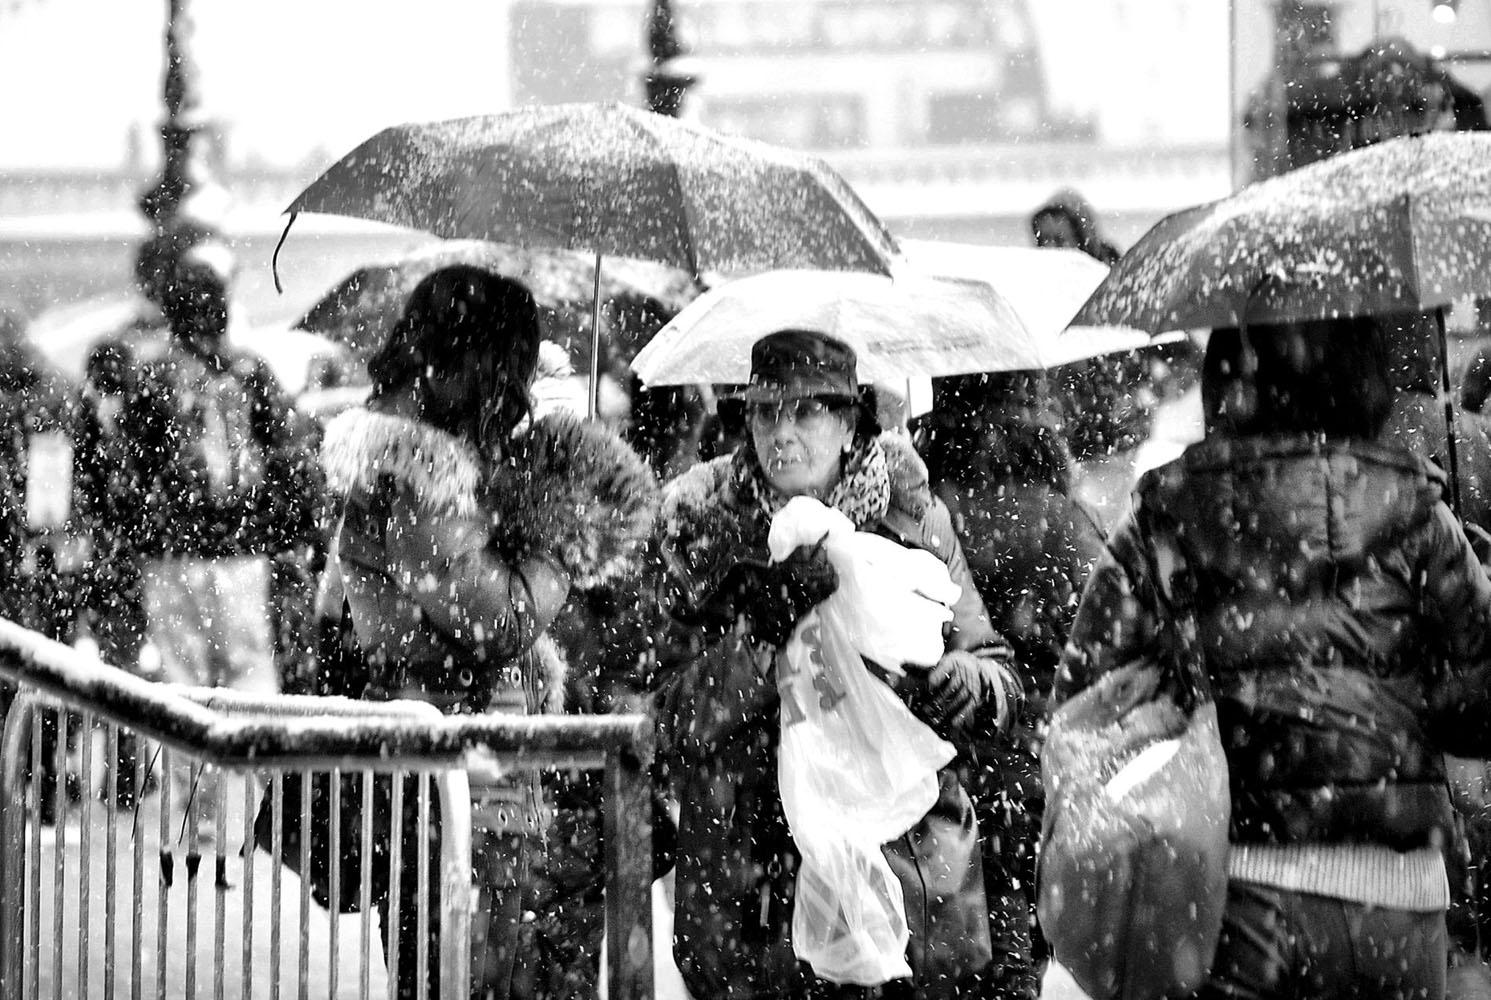 Madiha_Abdo_05London Snowy Day